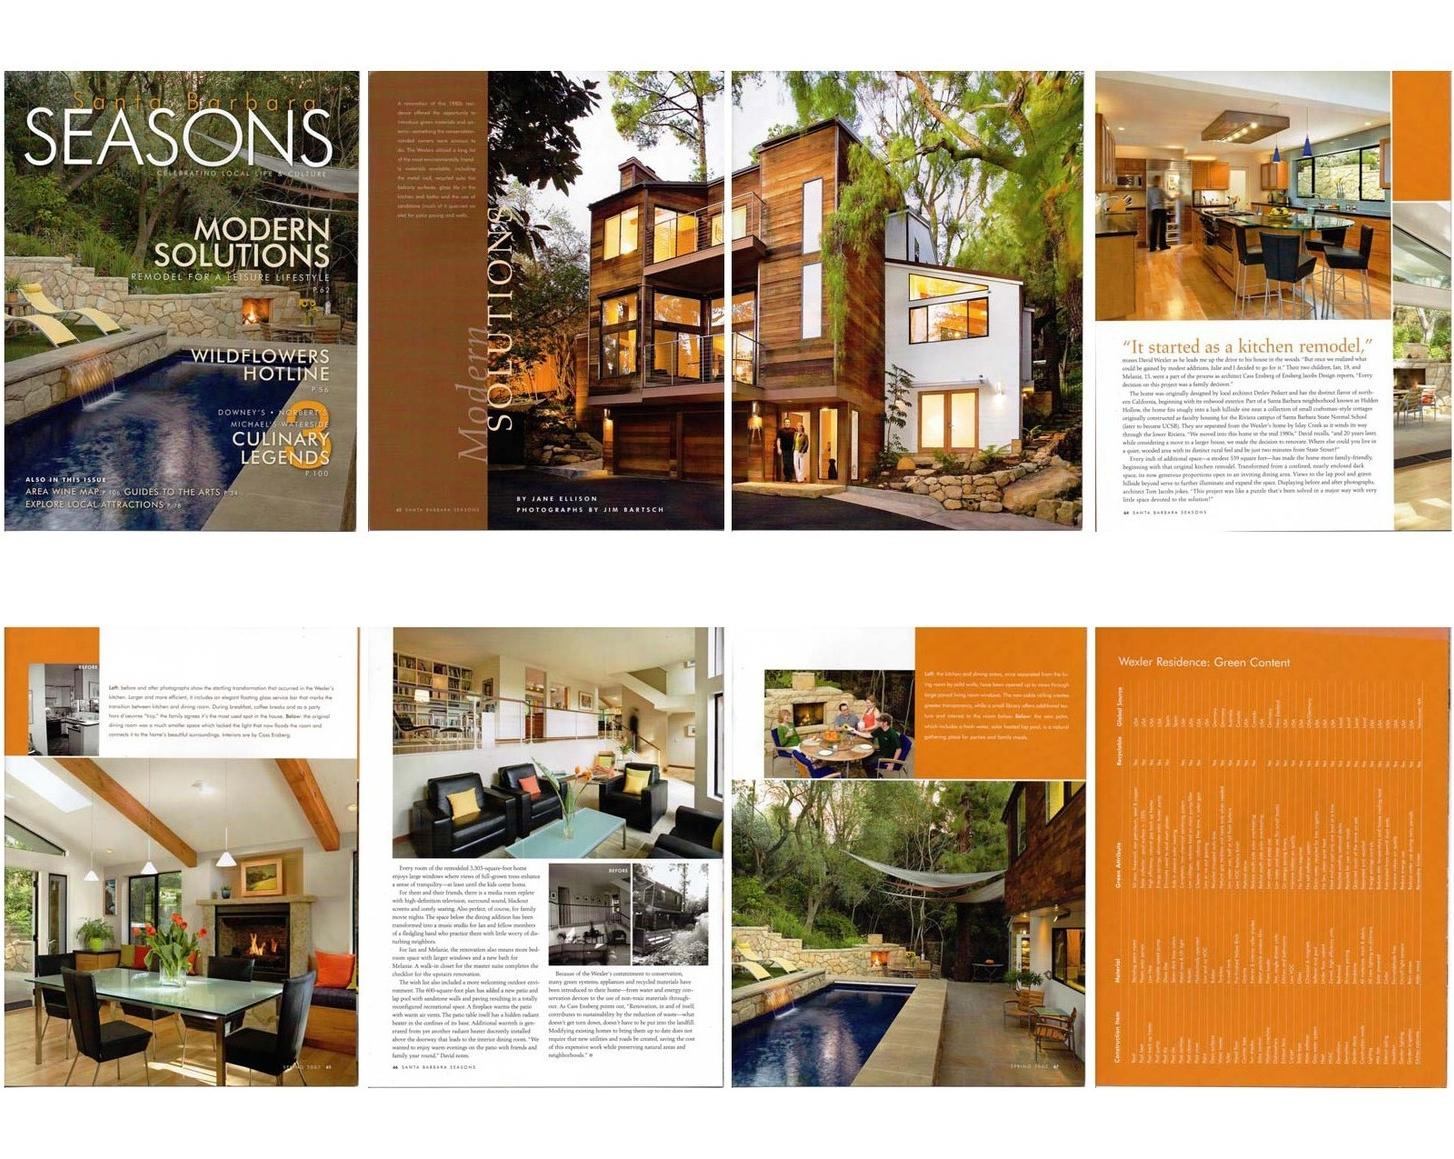 Seasons Magazine Feature